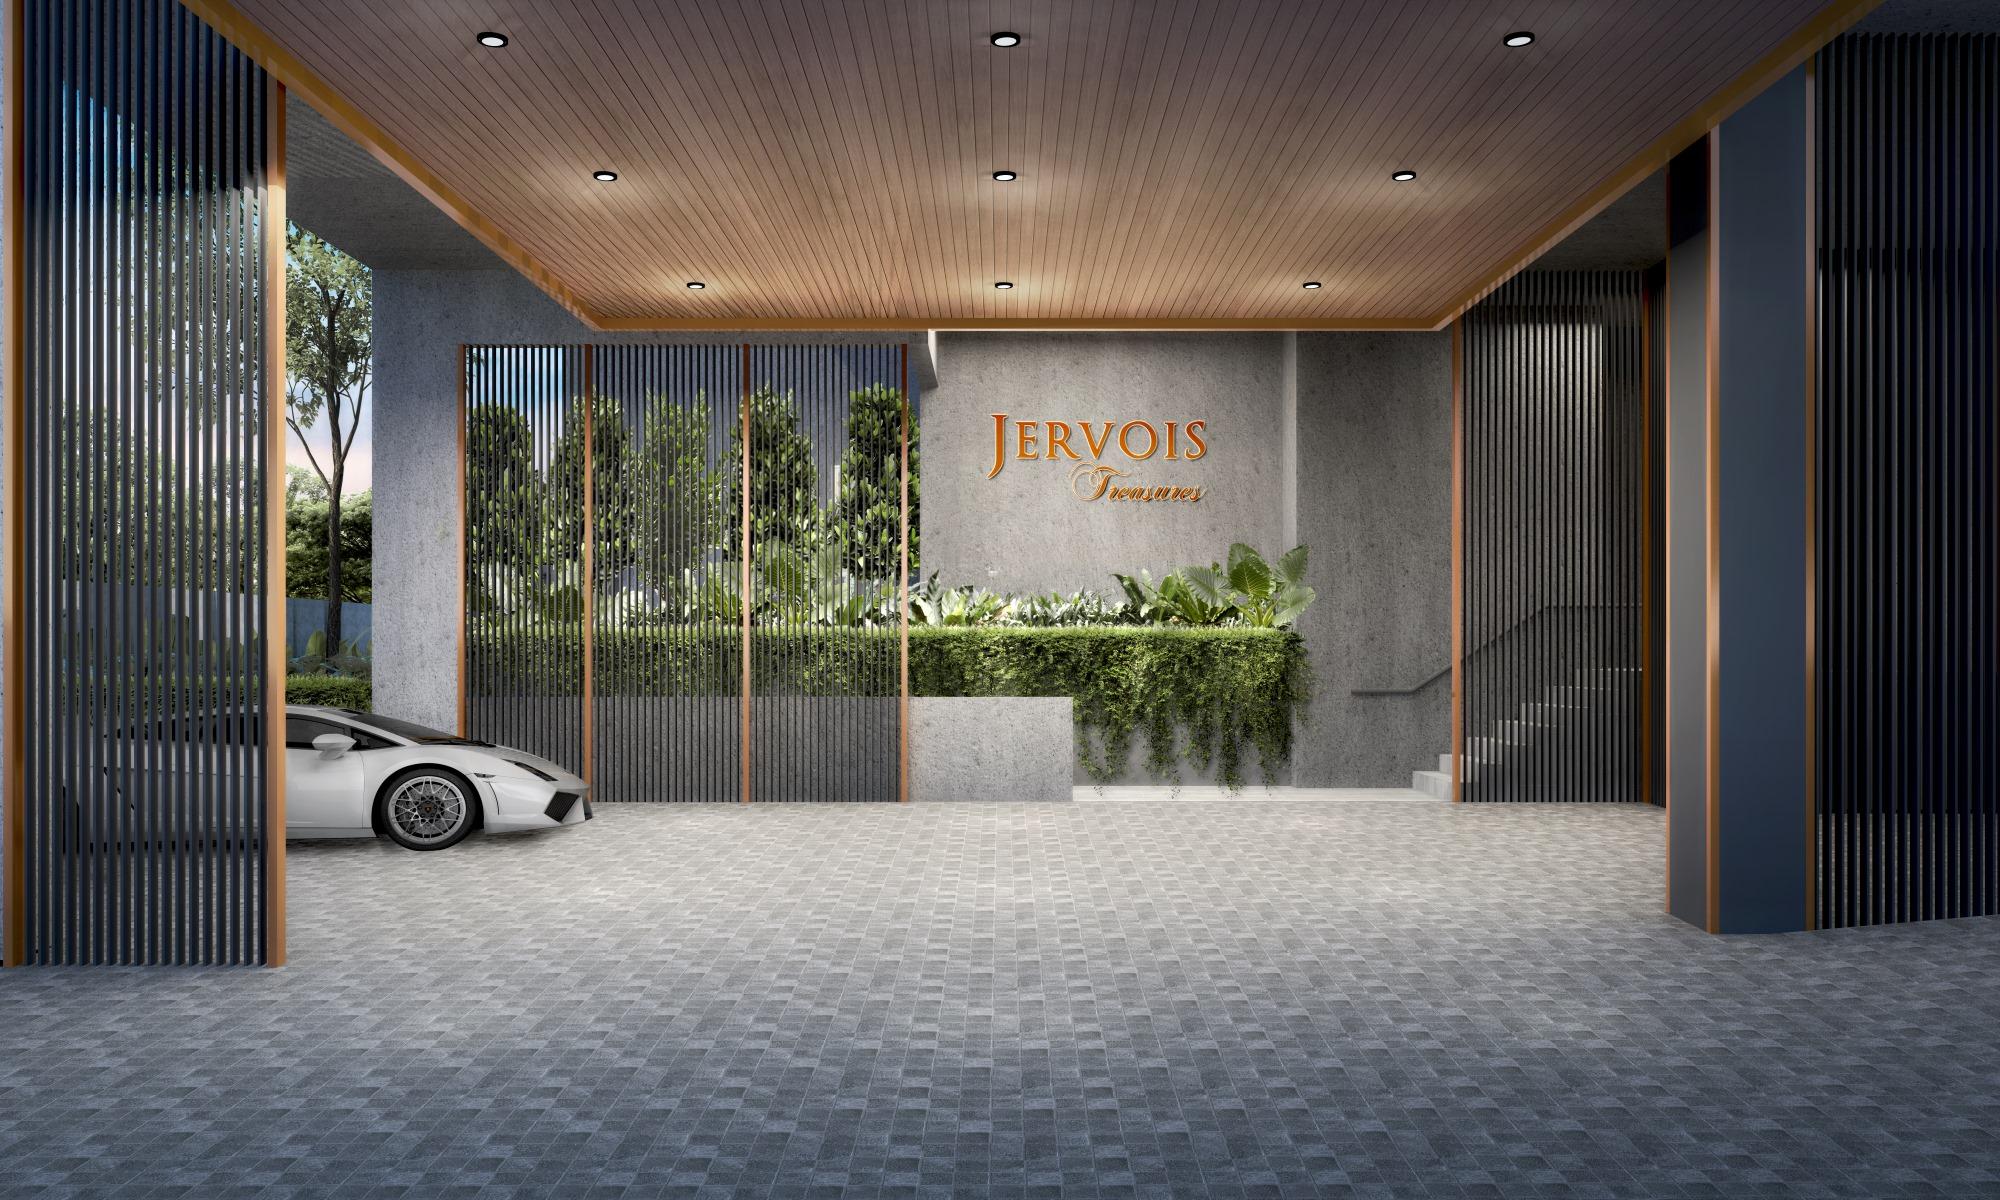 Jervois Treasures image